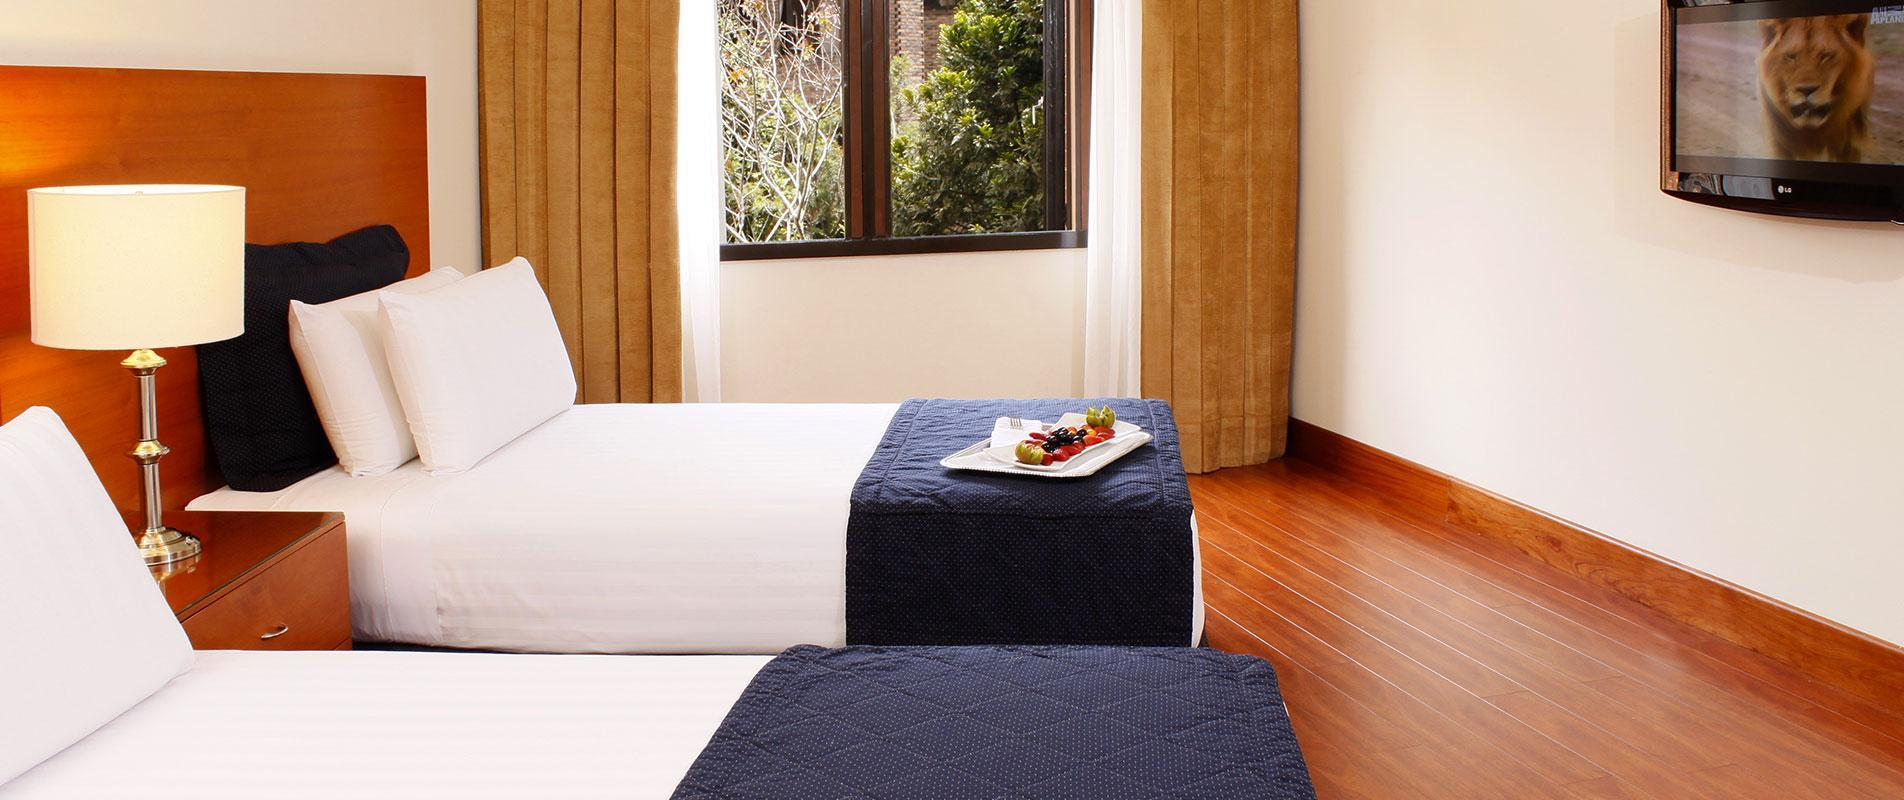 Room-Apartments-Bogota